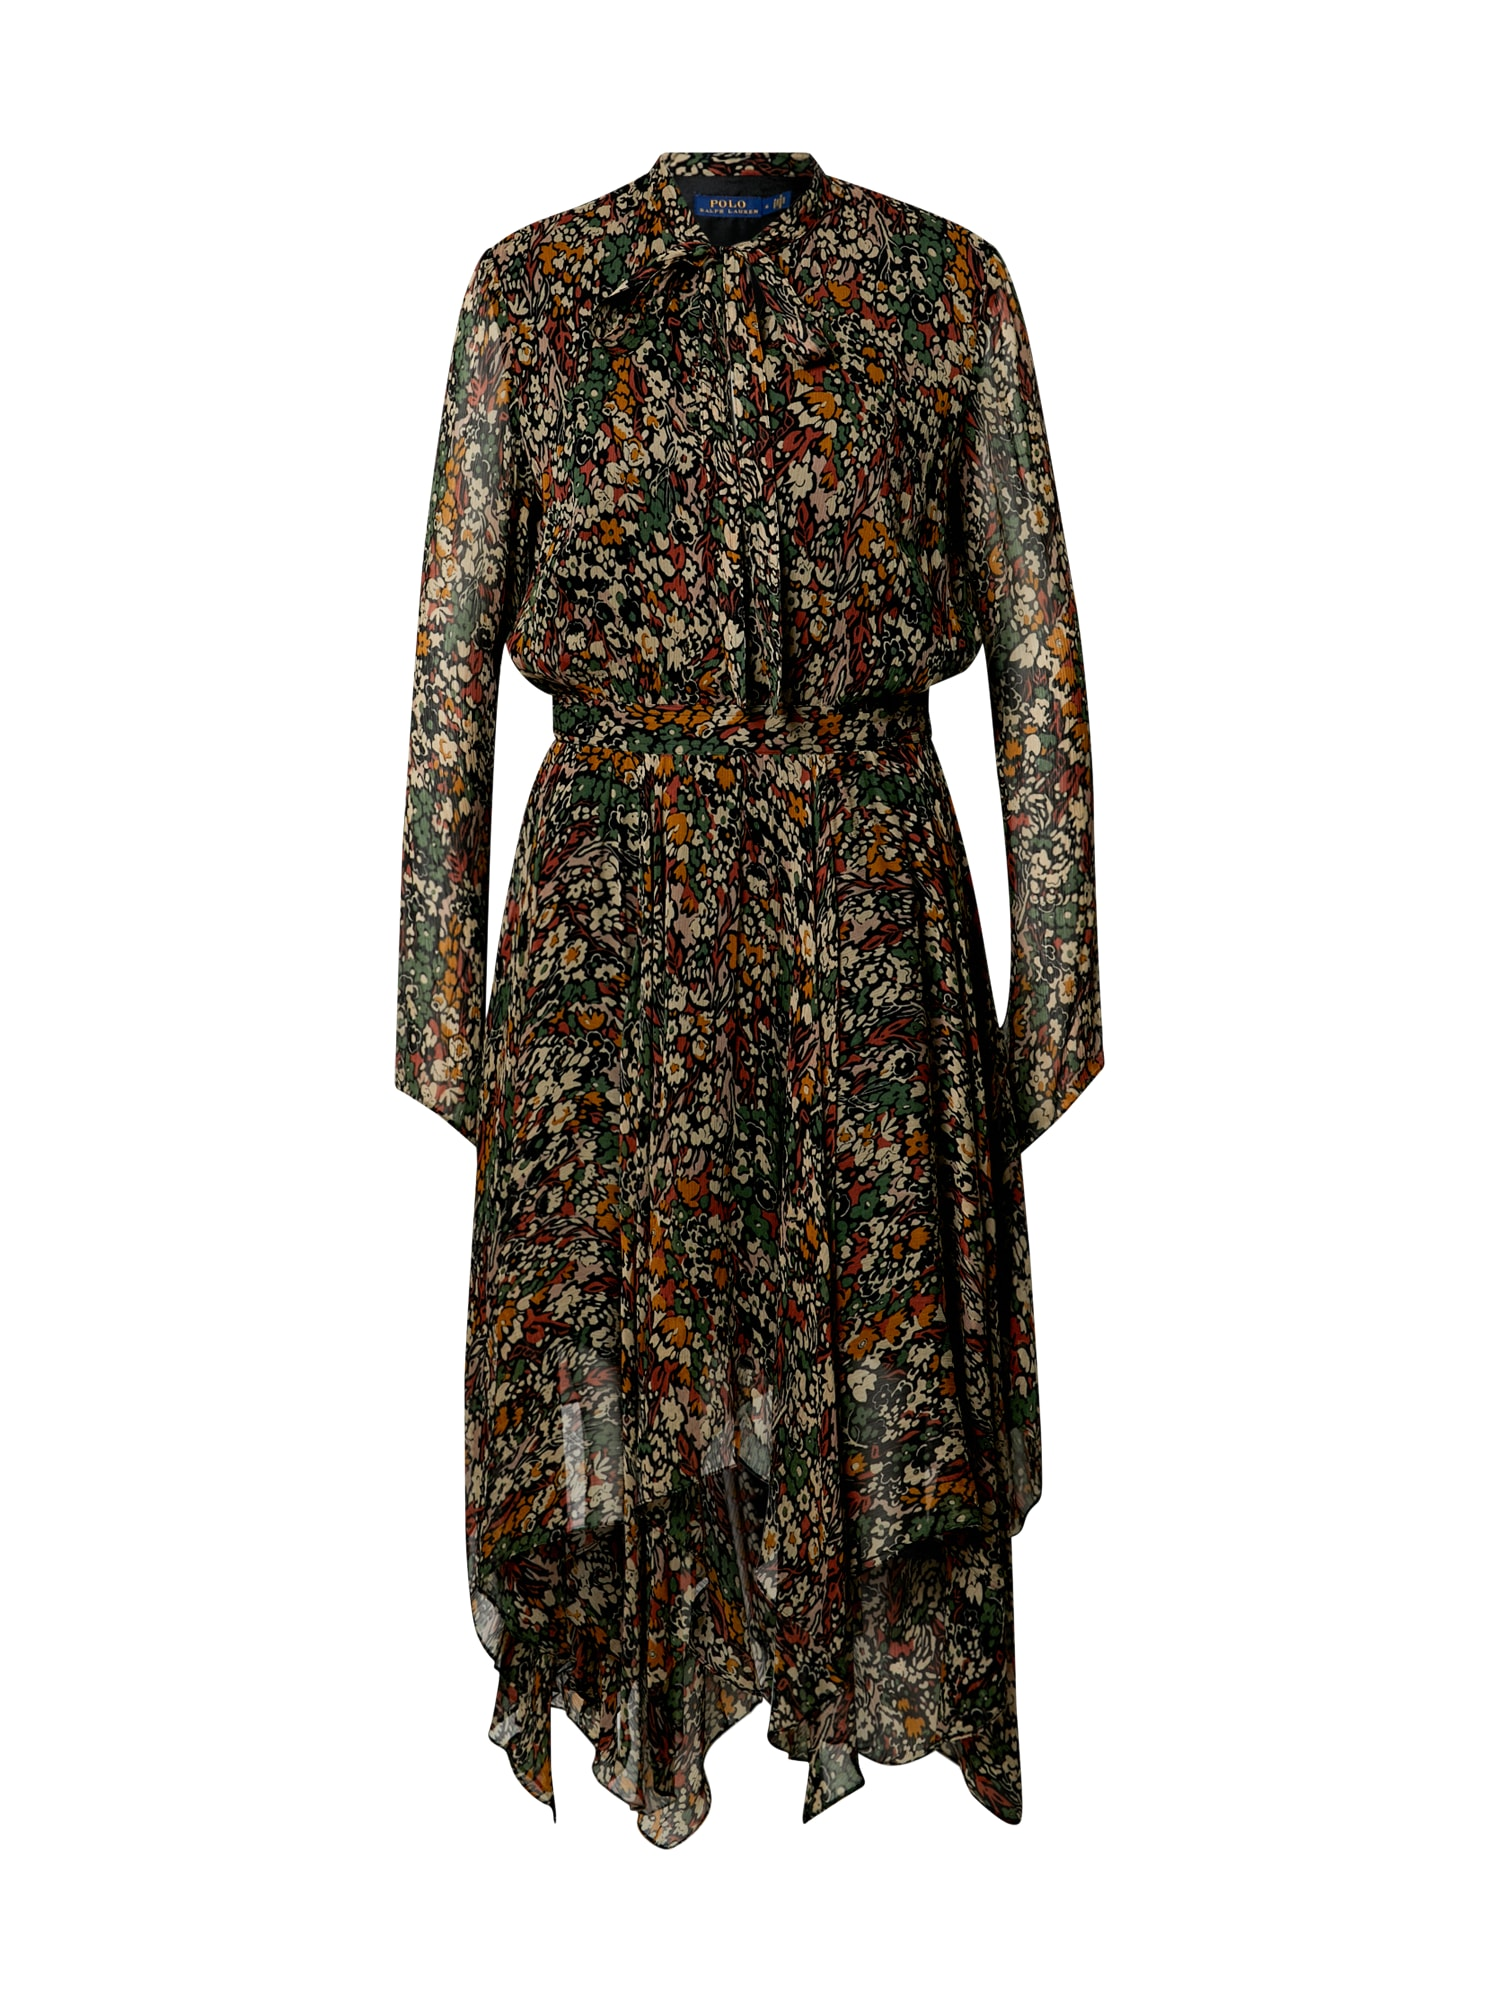 POLO RALPH LAUREN Šaty  hnědá / mix barev